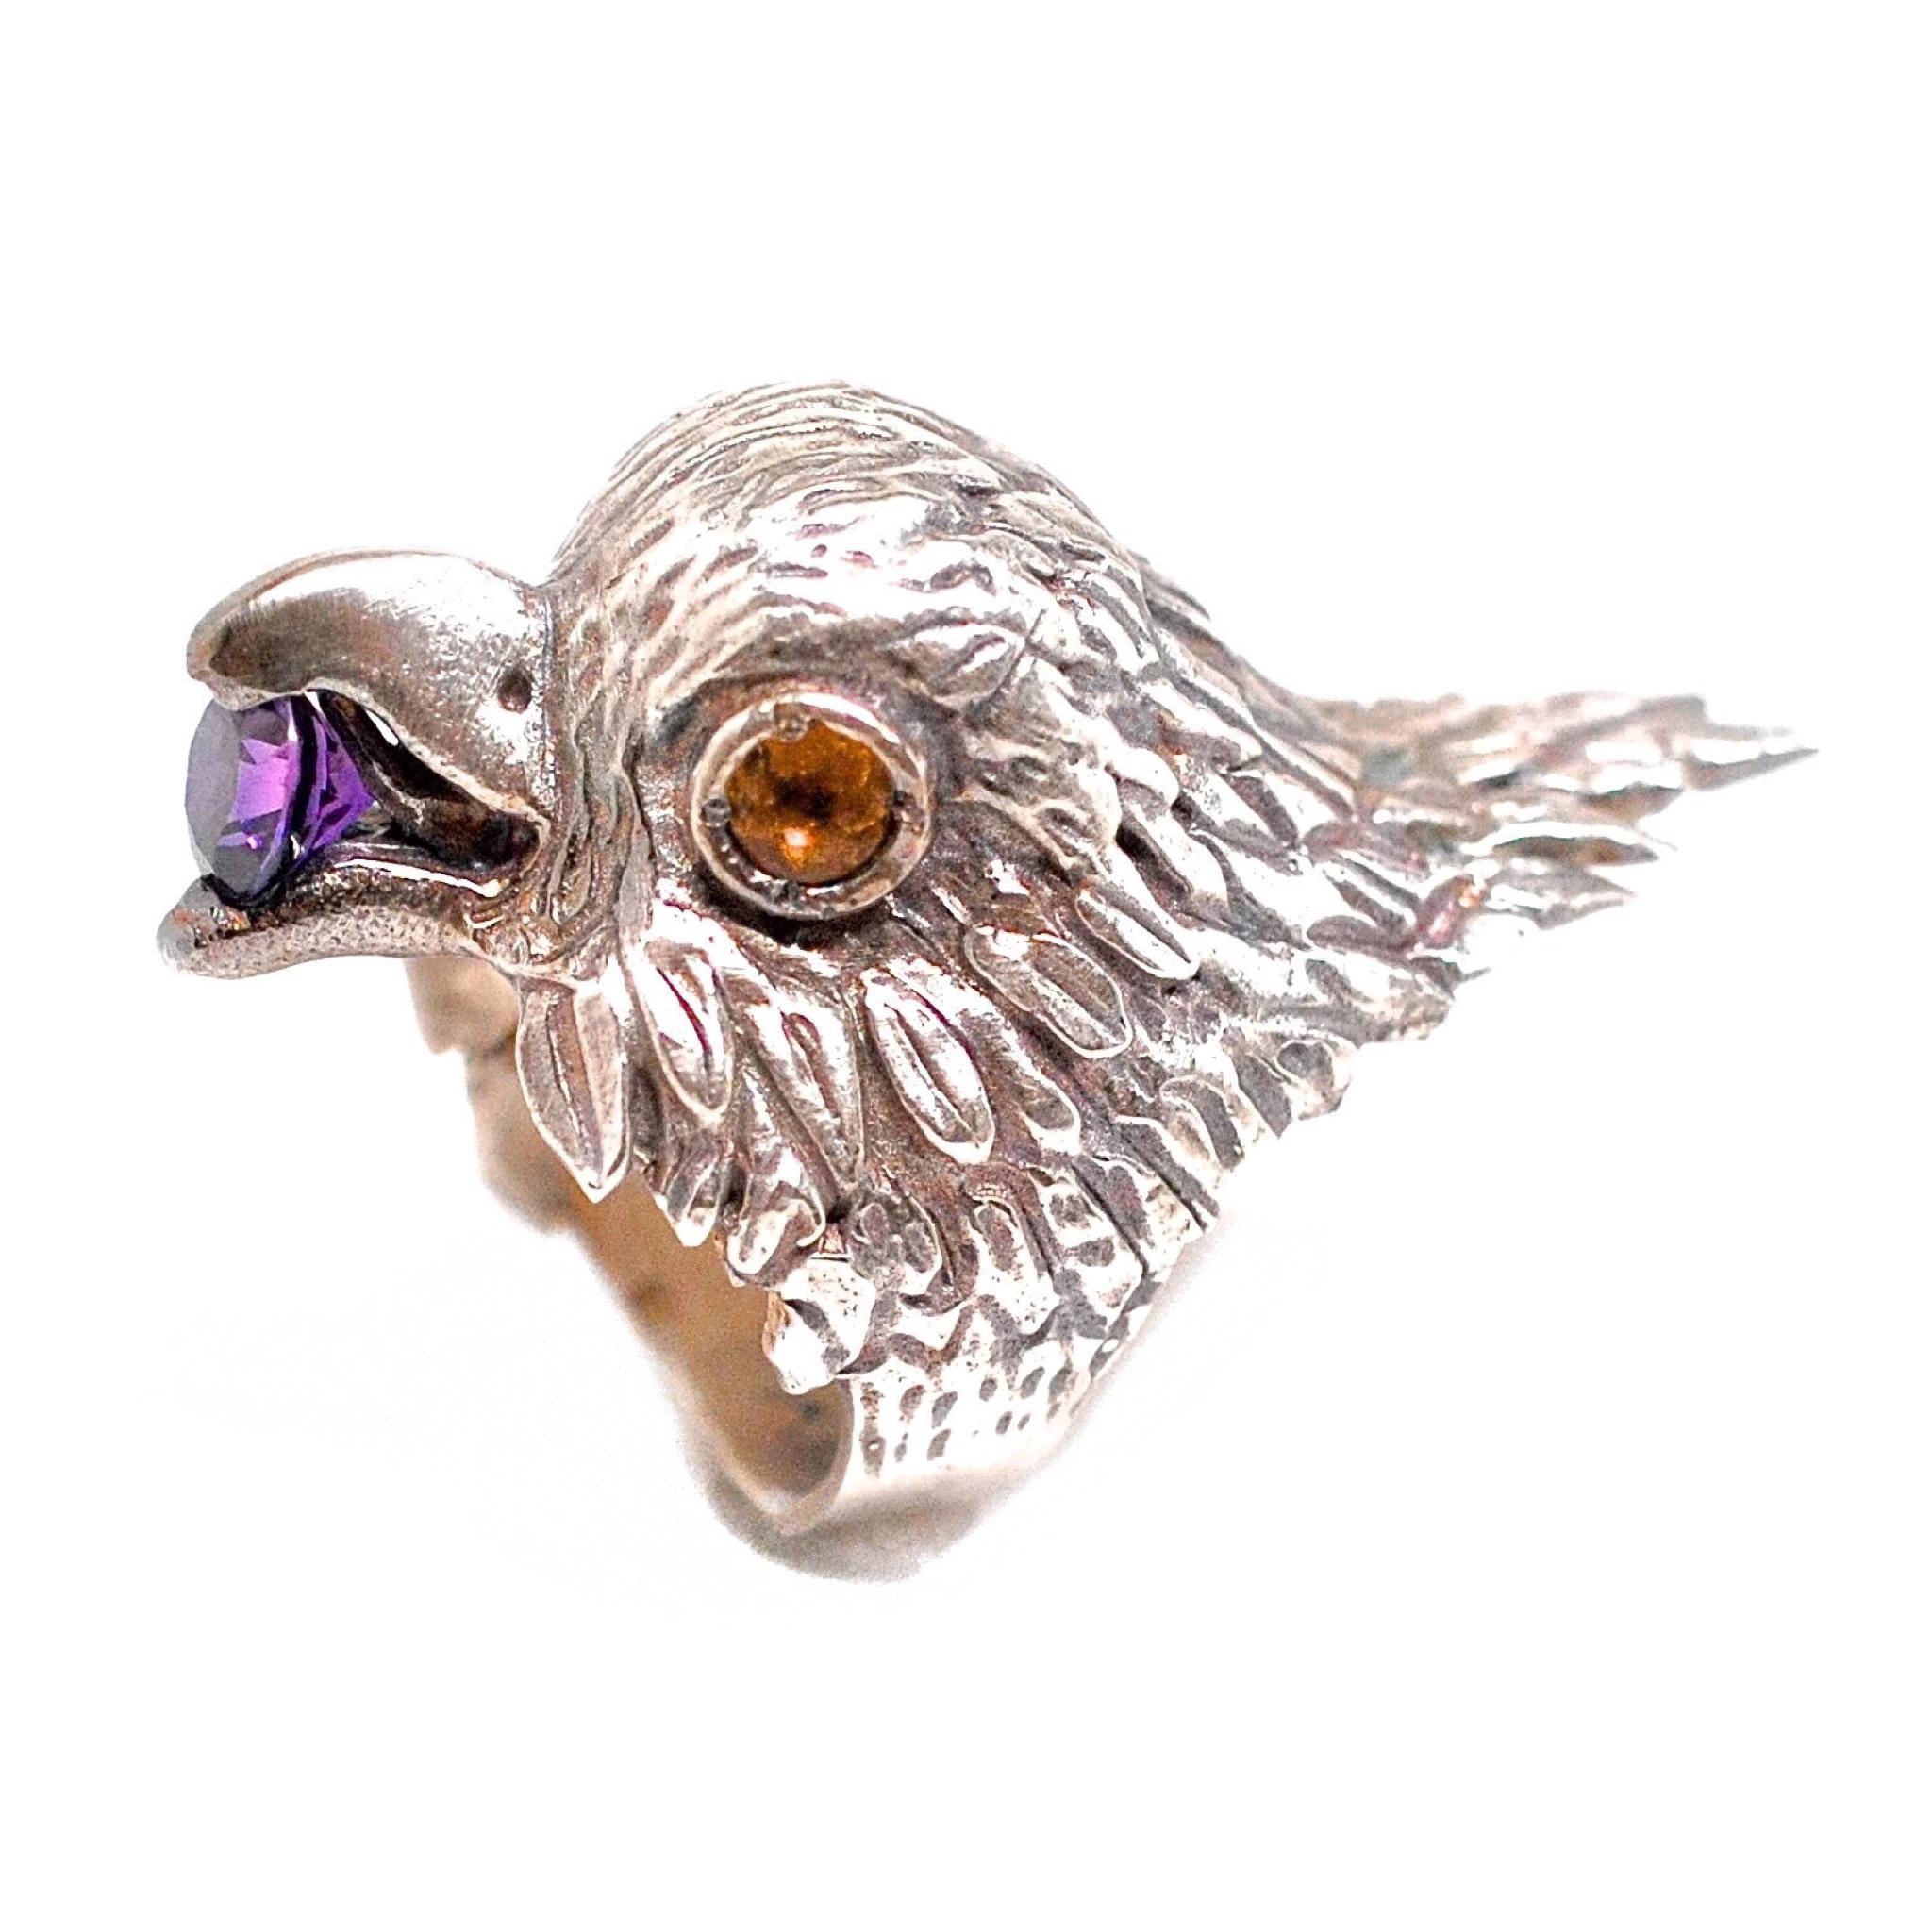 Mabis Bird Ring4.JPG